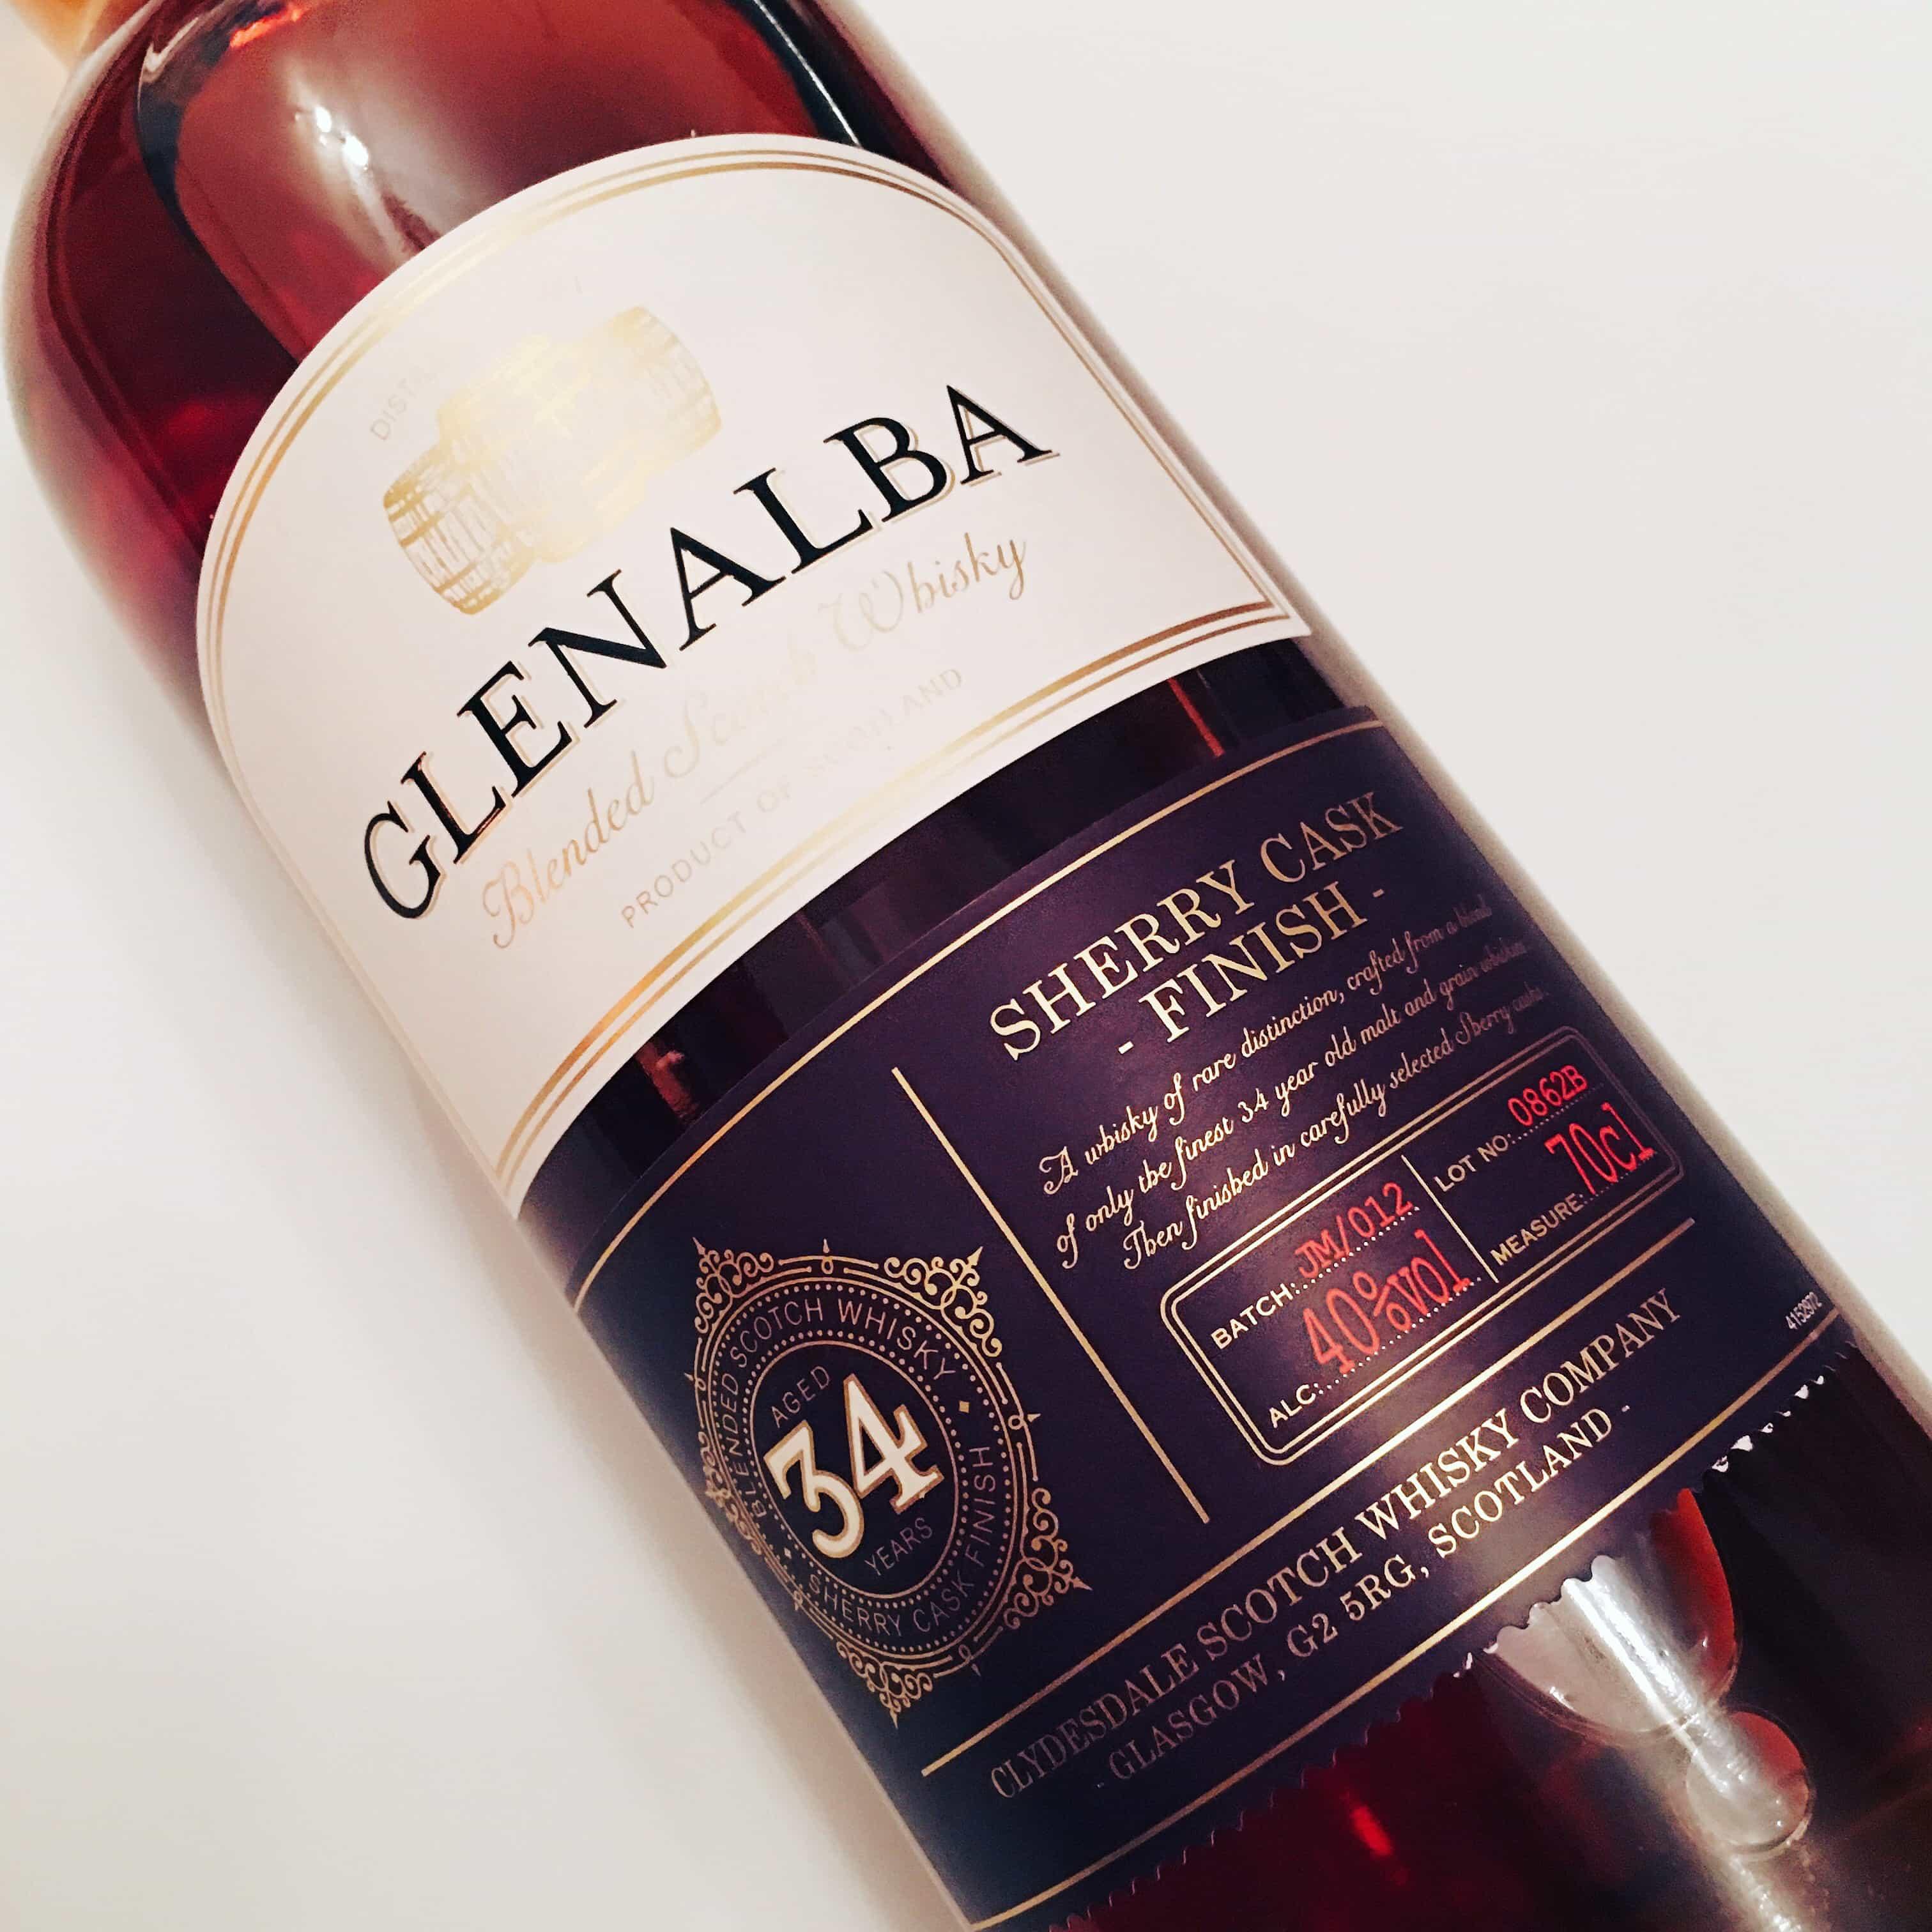 Glen Alba 34